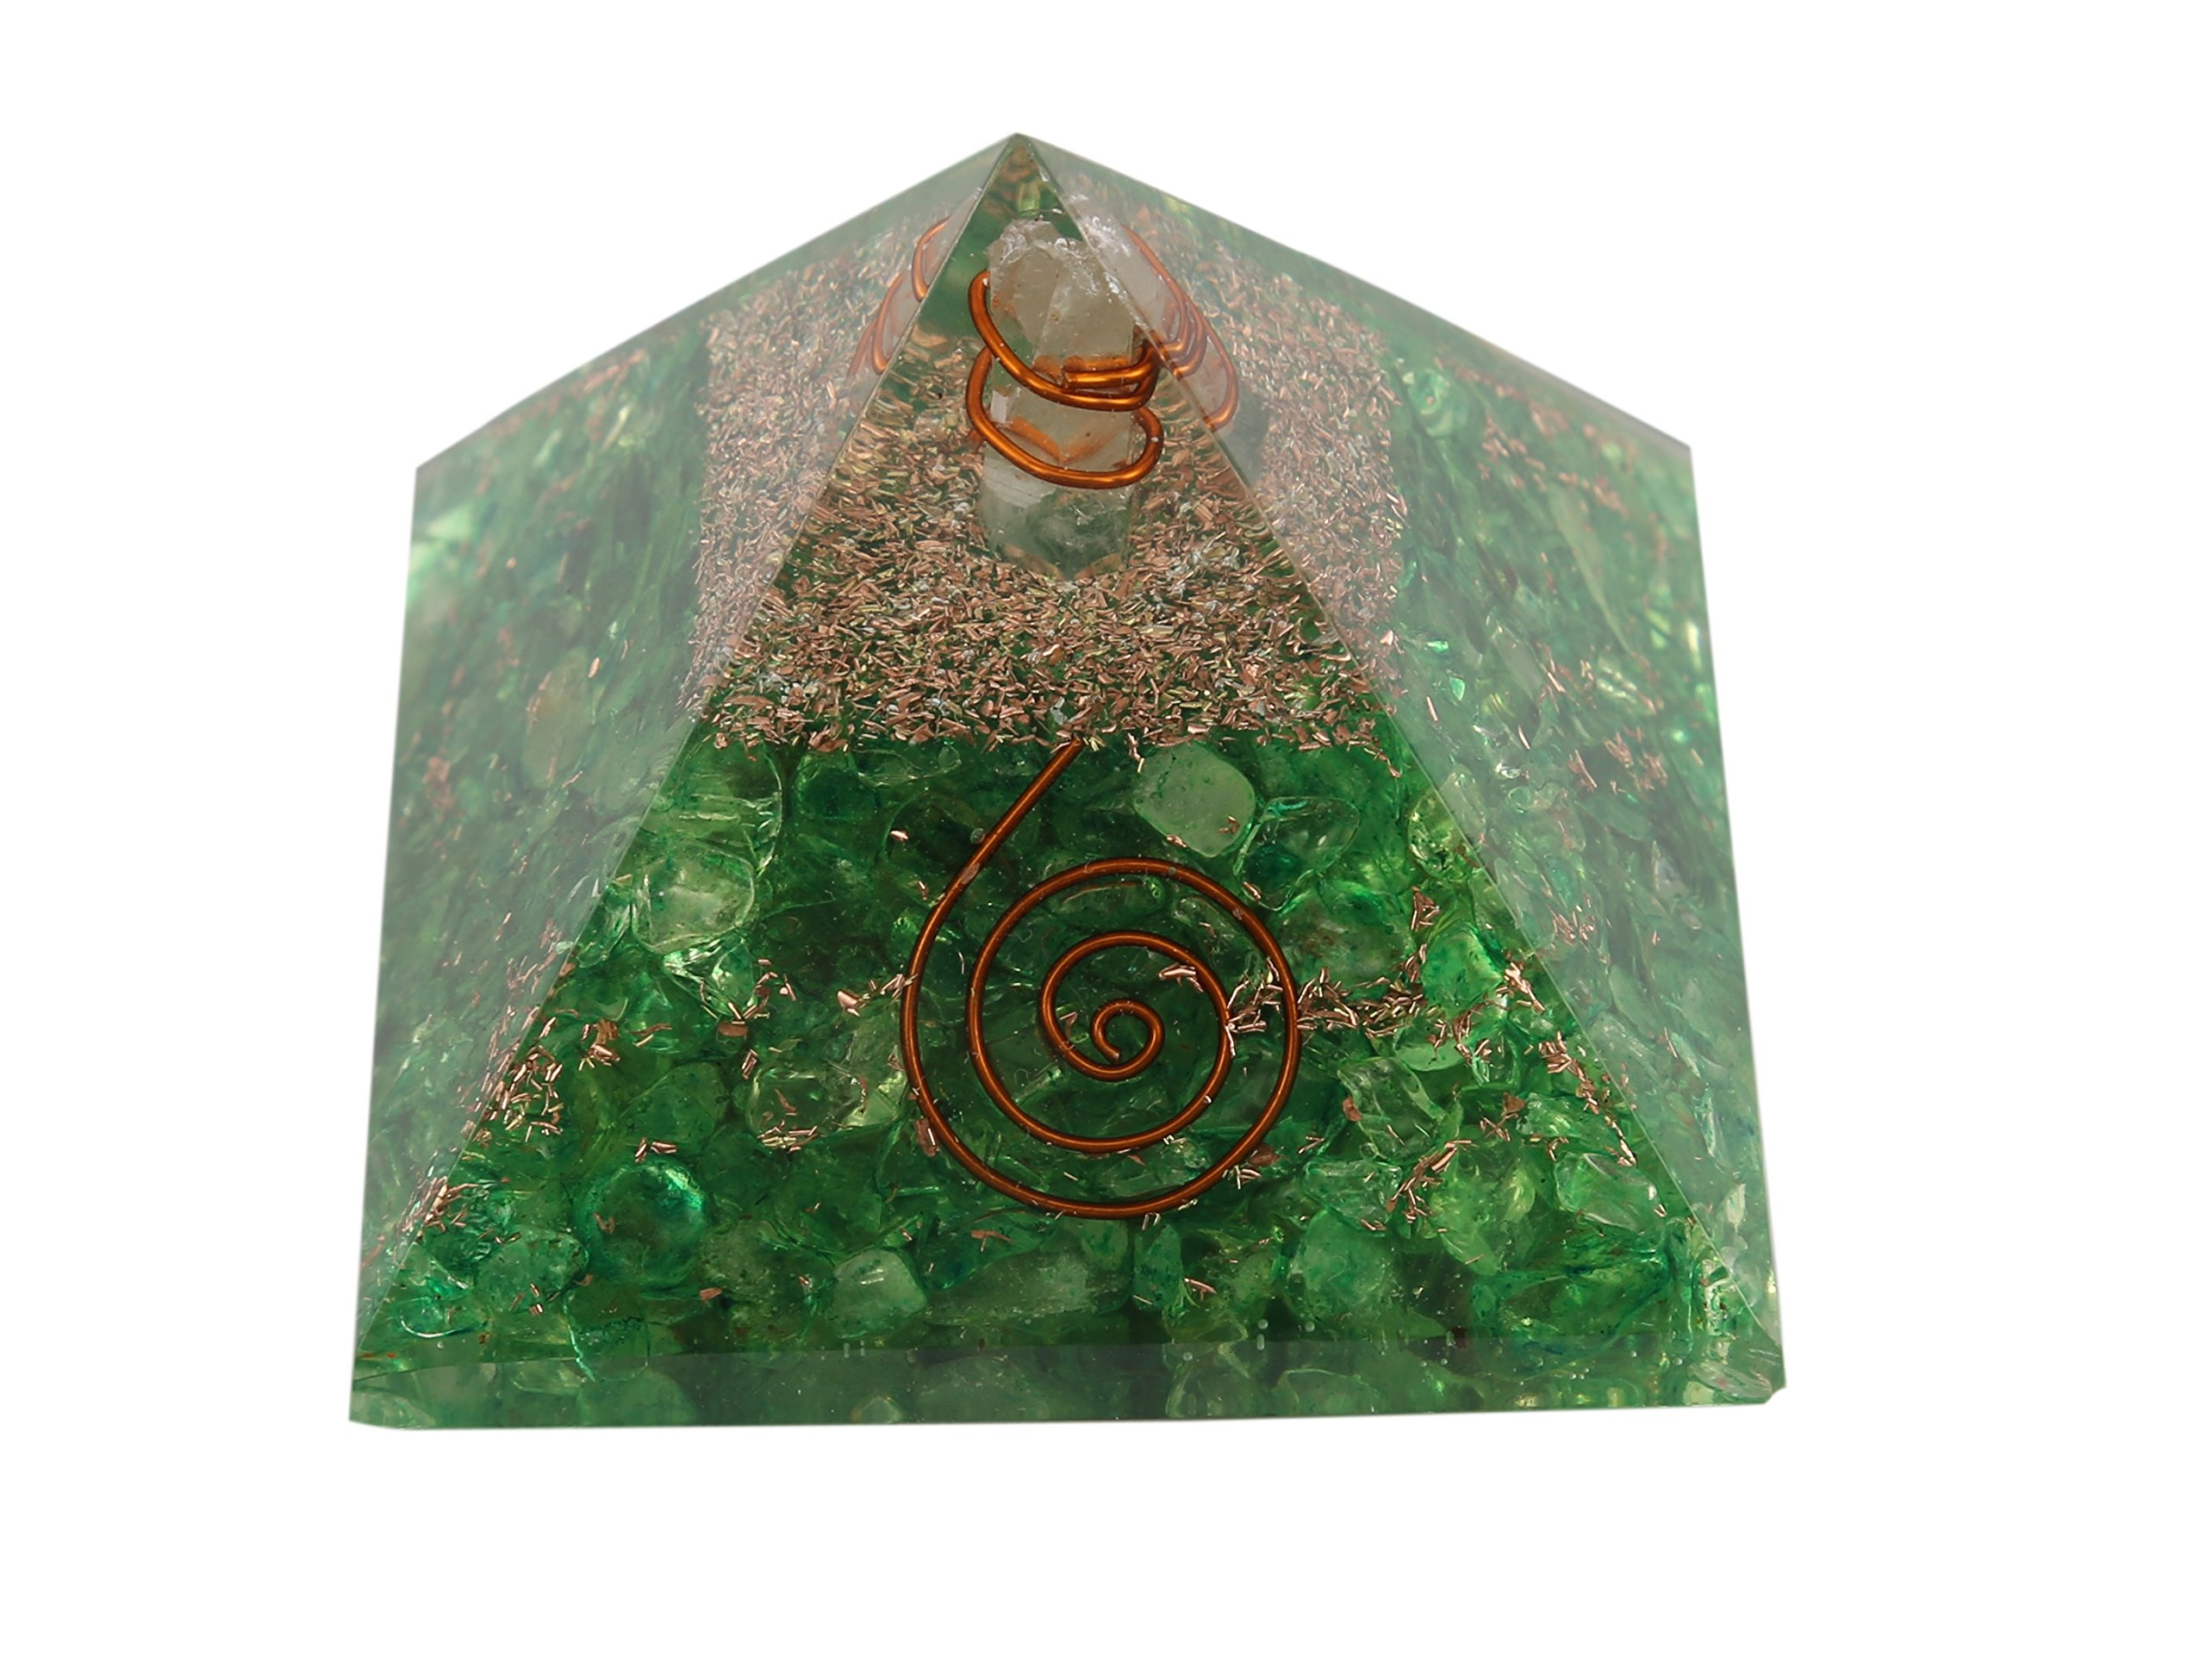 Aatm Reiki Energized Chakra Healing Green Aventurine Orgone Pyramid With Clear Crystal Gemstone/EMF Protection Meditation Yoga Energy Generator